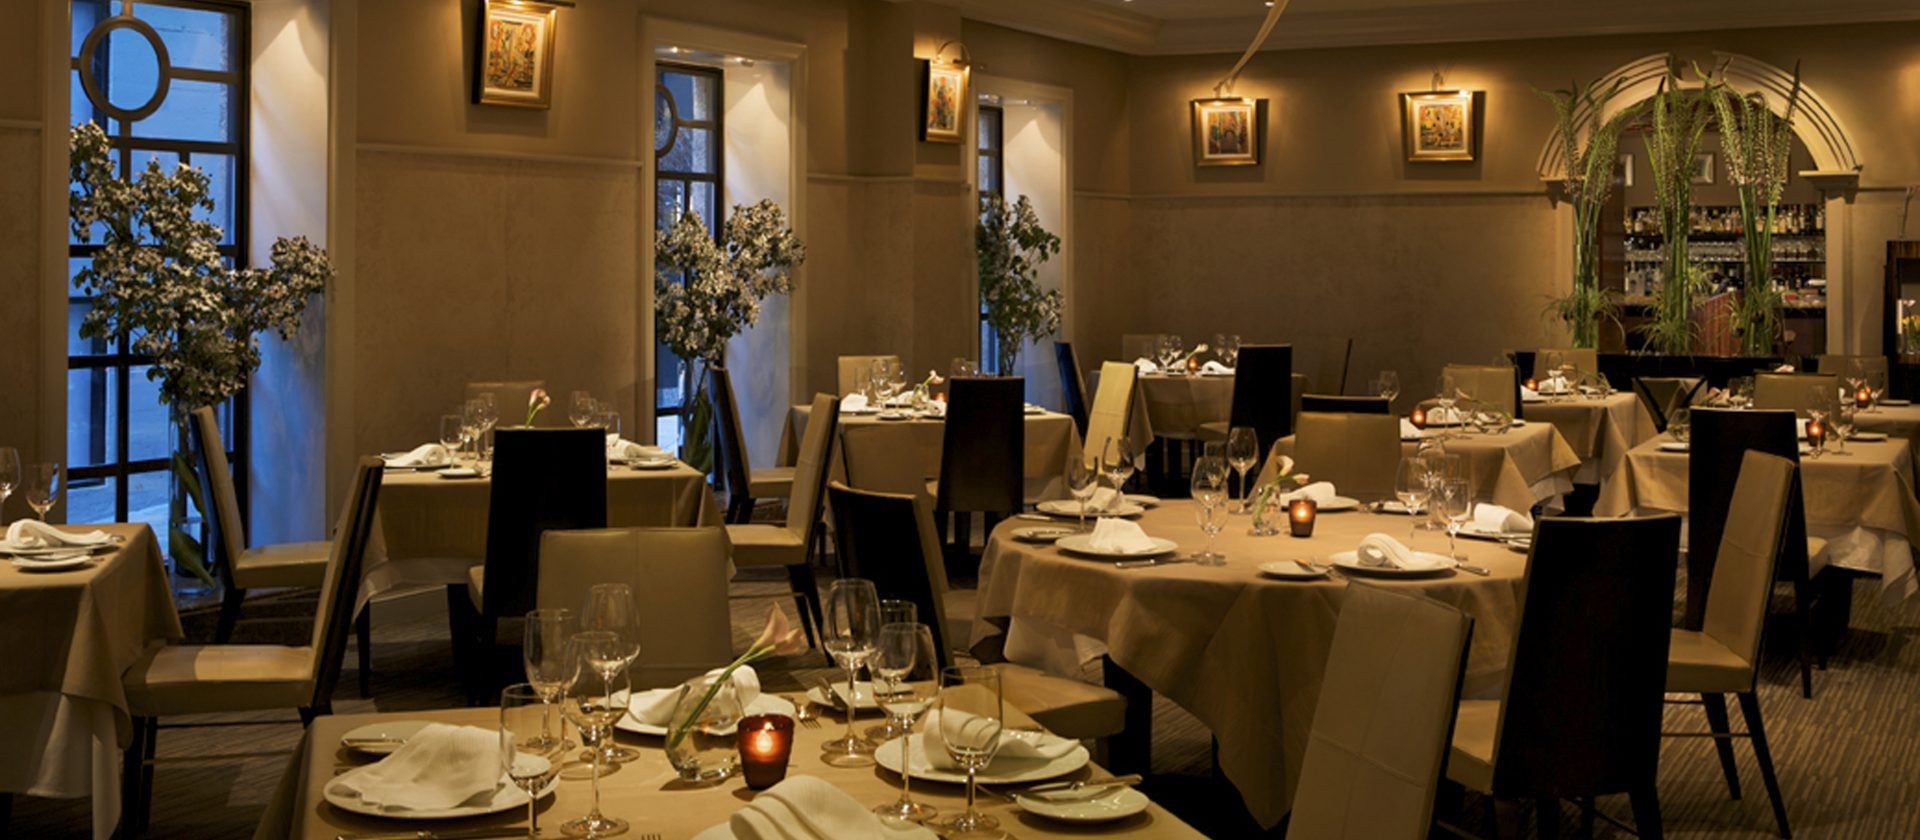 Jasa website restoran Malinau 085695285999